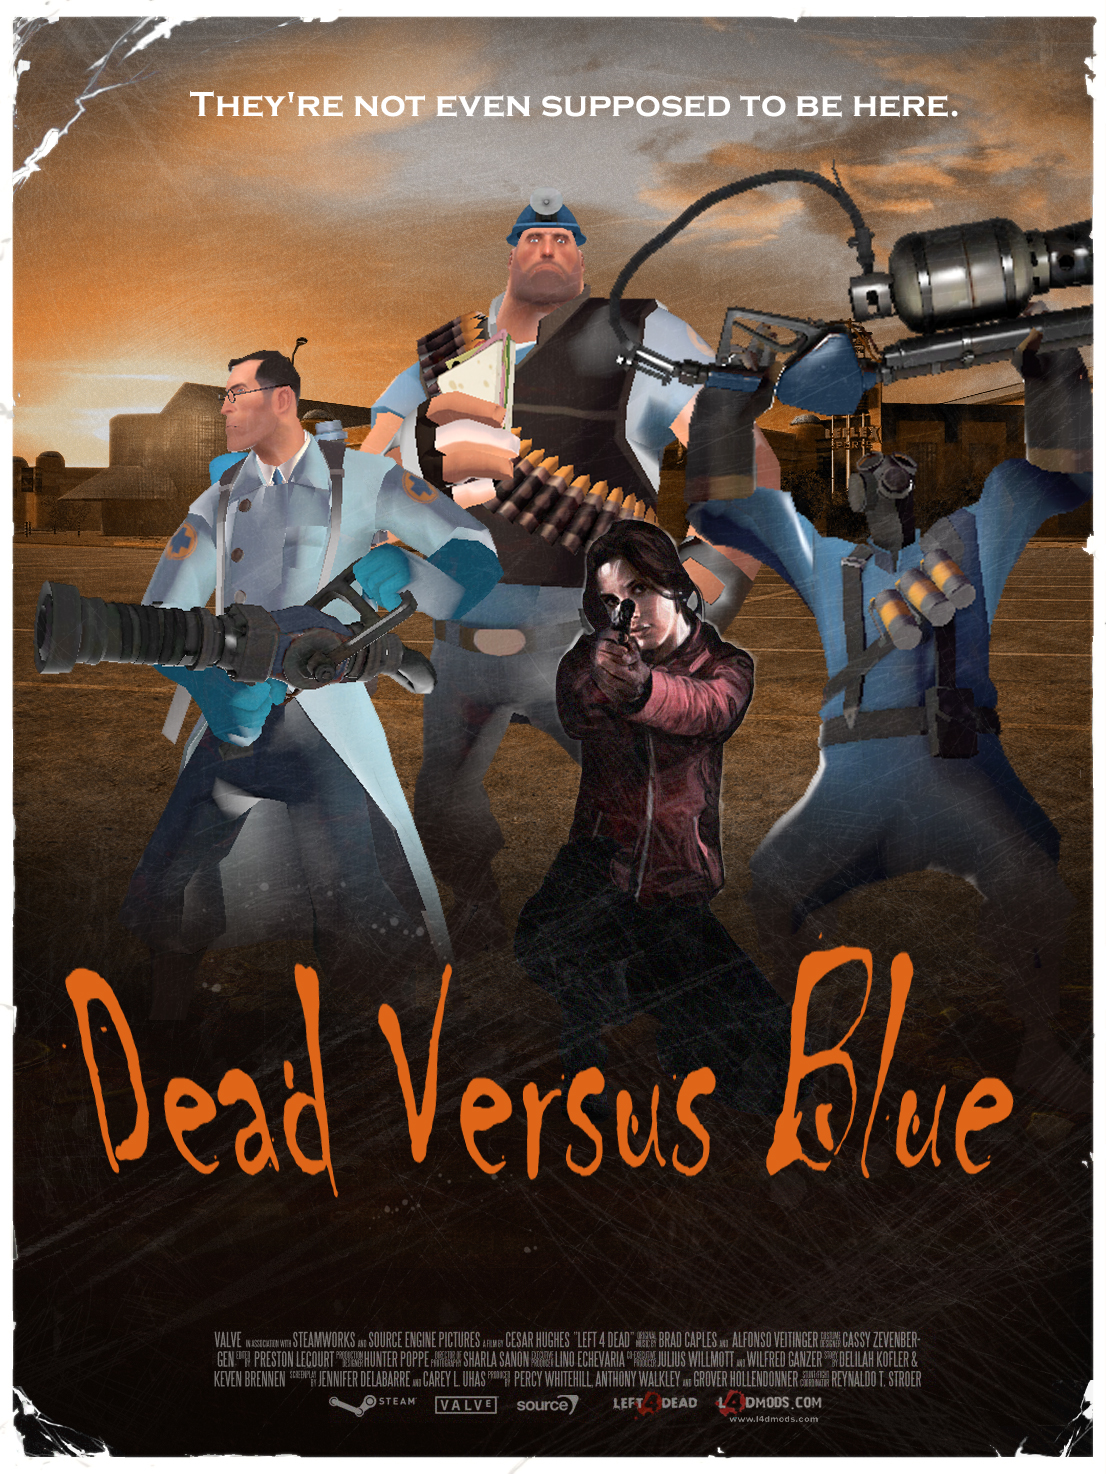 Dead_Versus_Blue_by_IosifTheEngineer.jpg